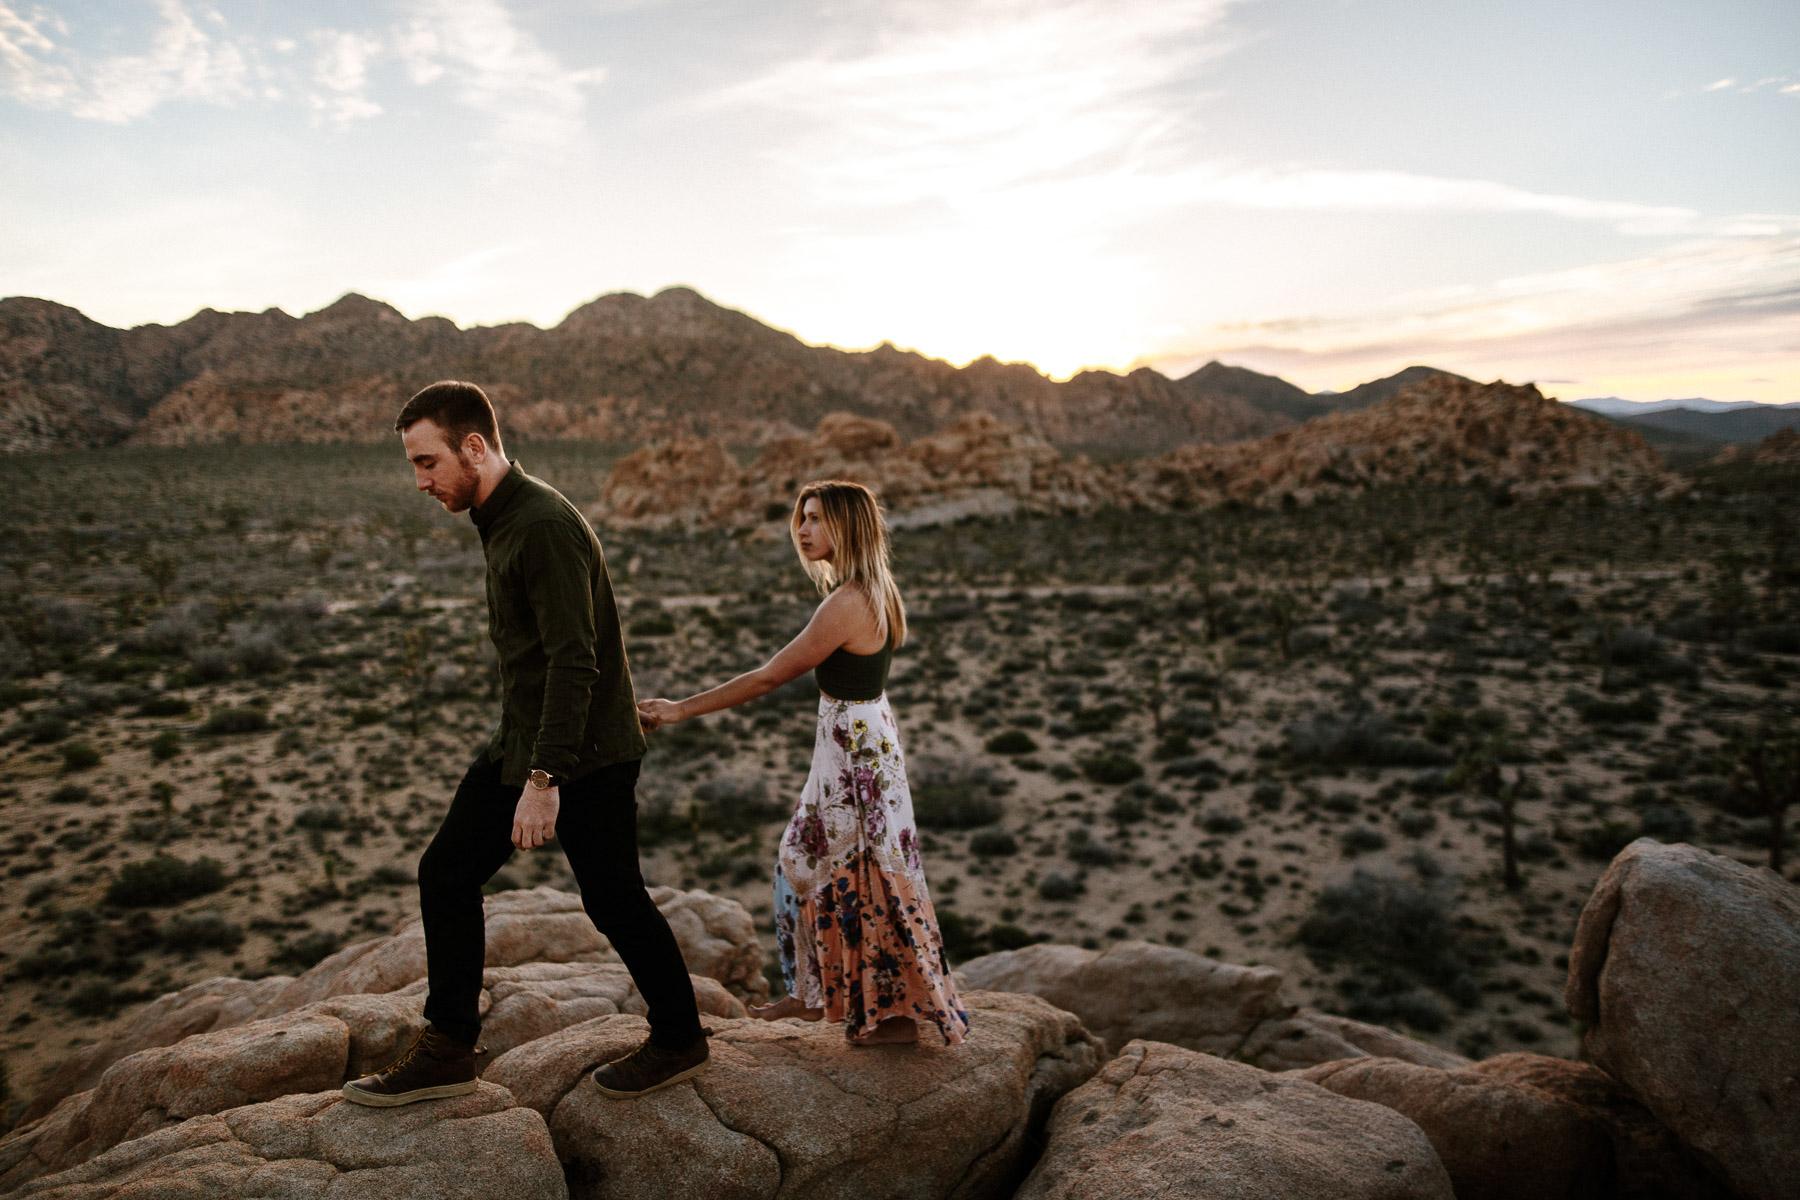 Joshua_Tree_Engagement_Wedding_Elopement_Photogapher_70.jpg